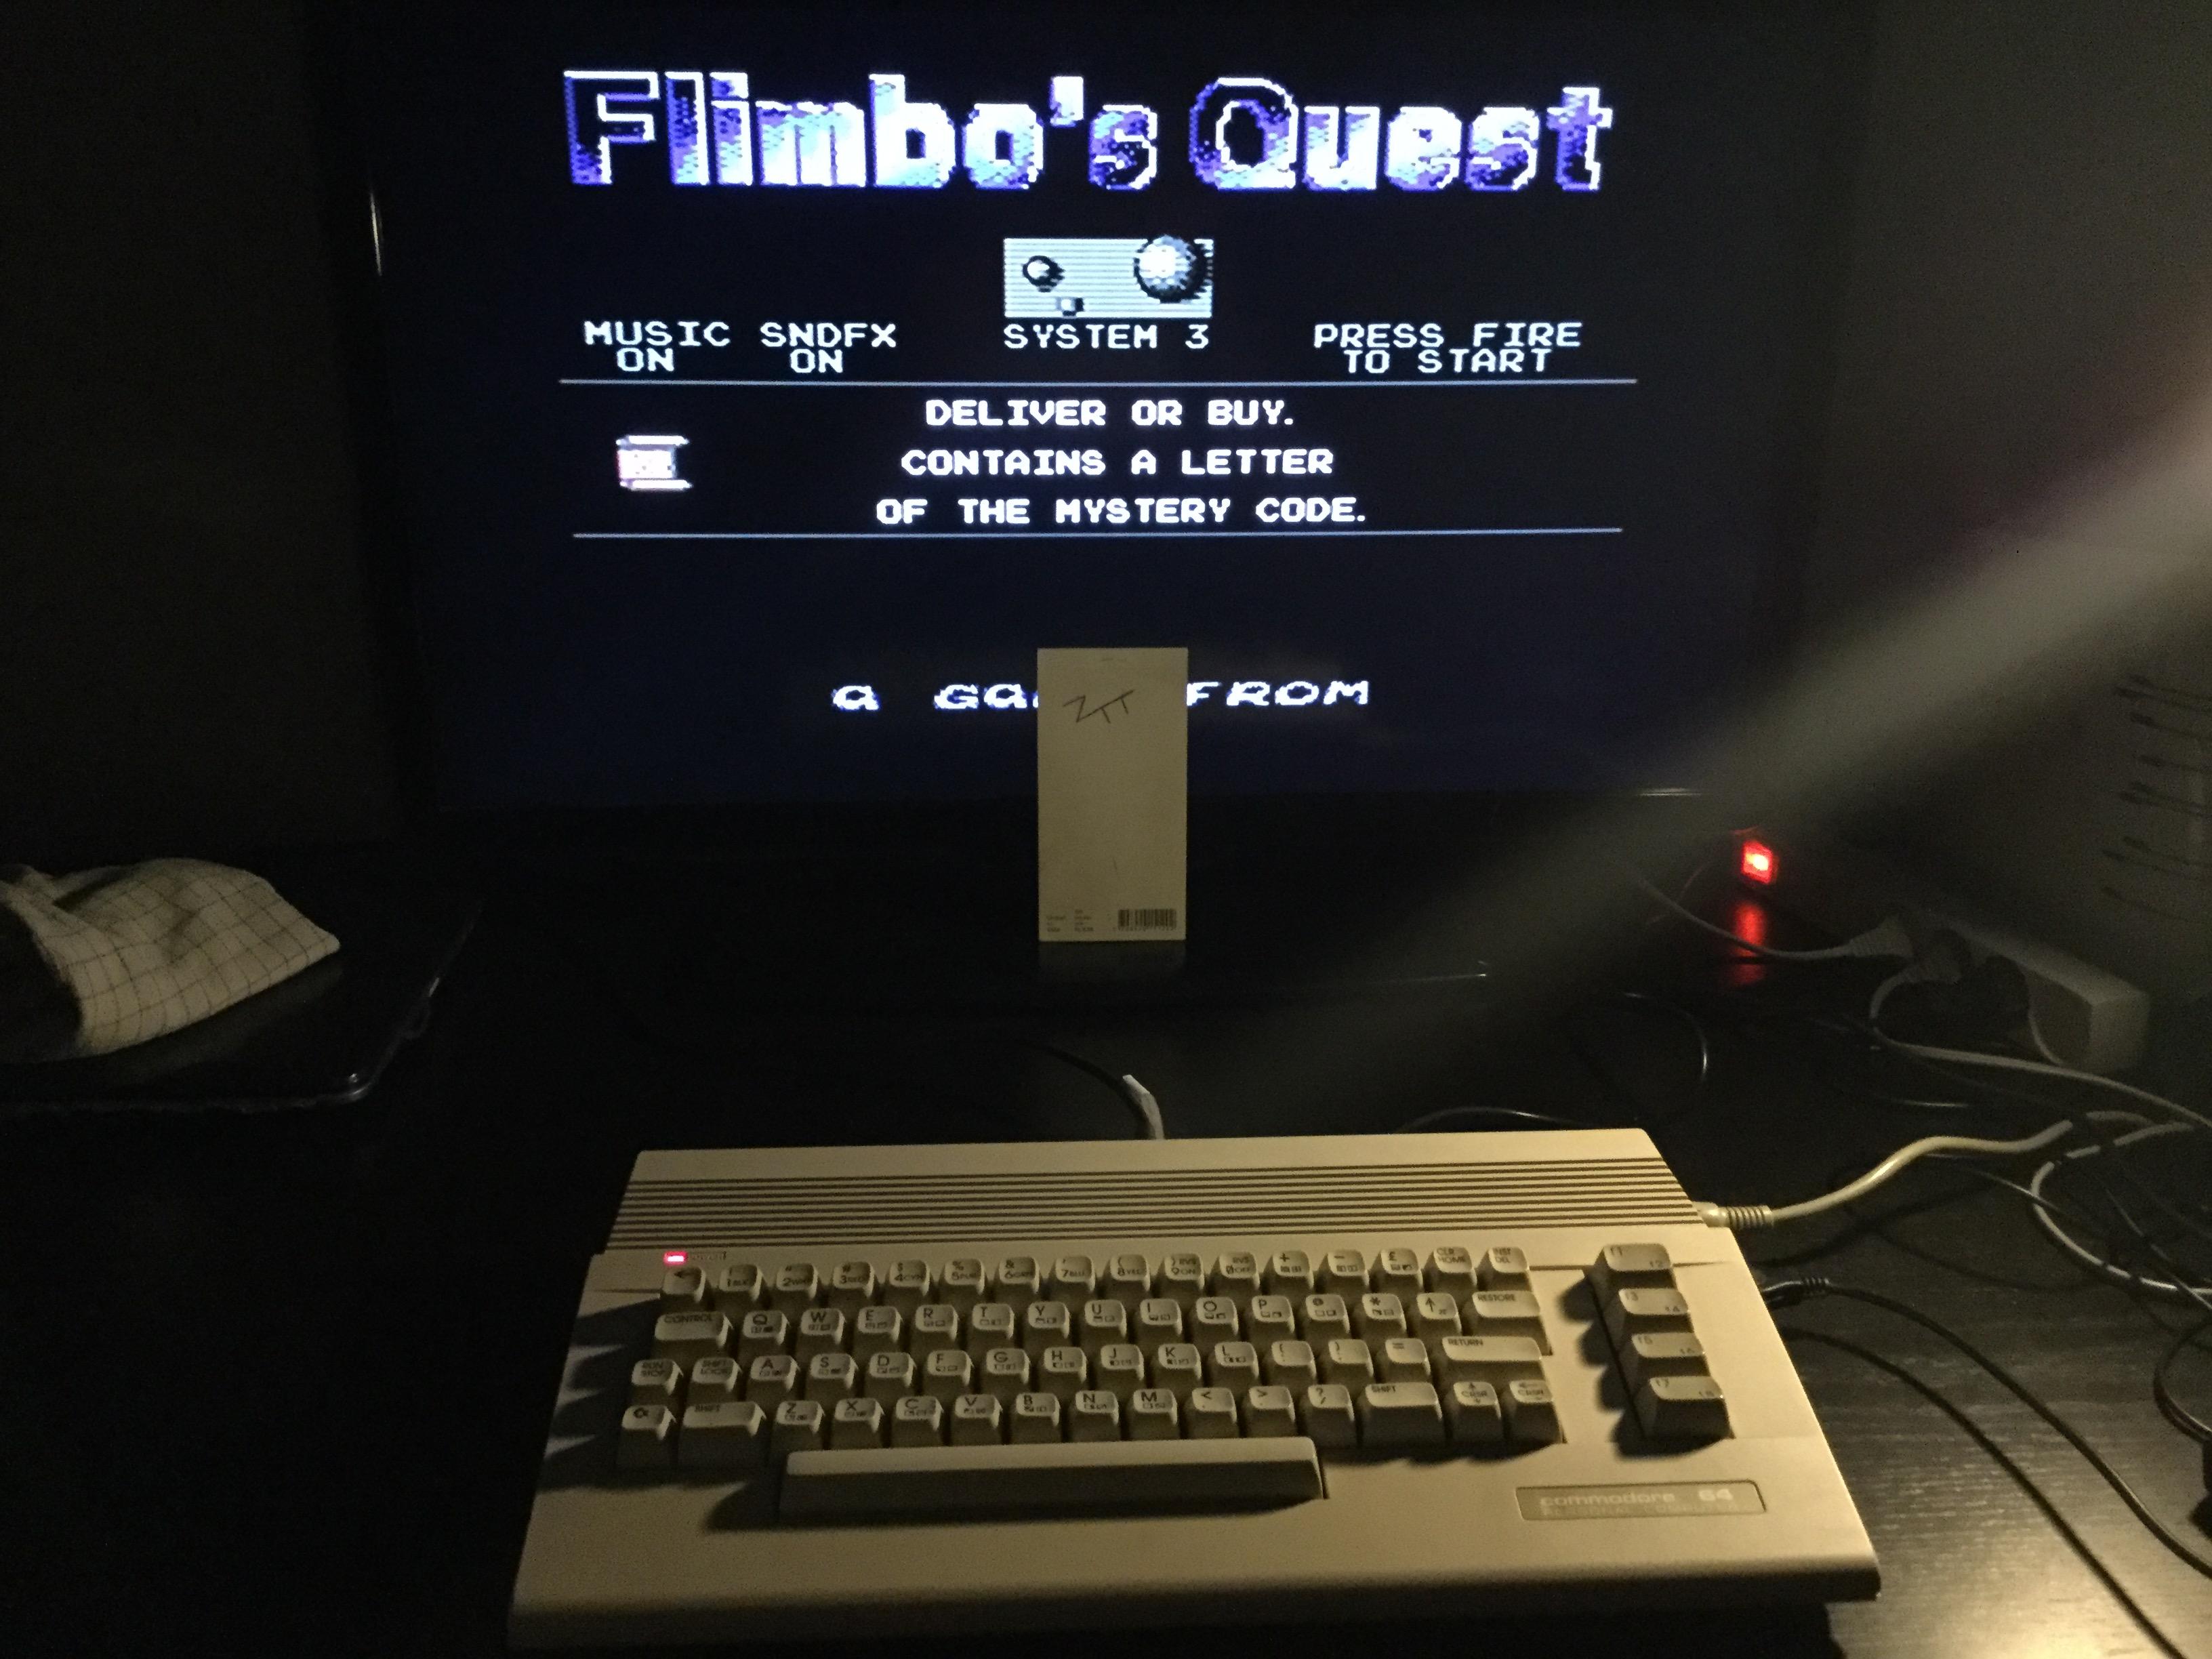 Frankie: Flimbo